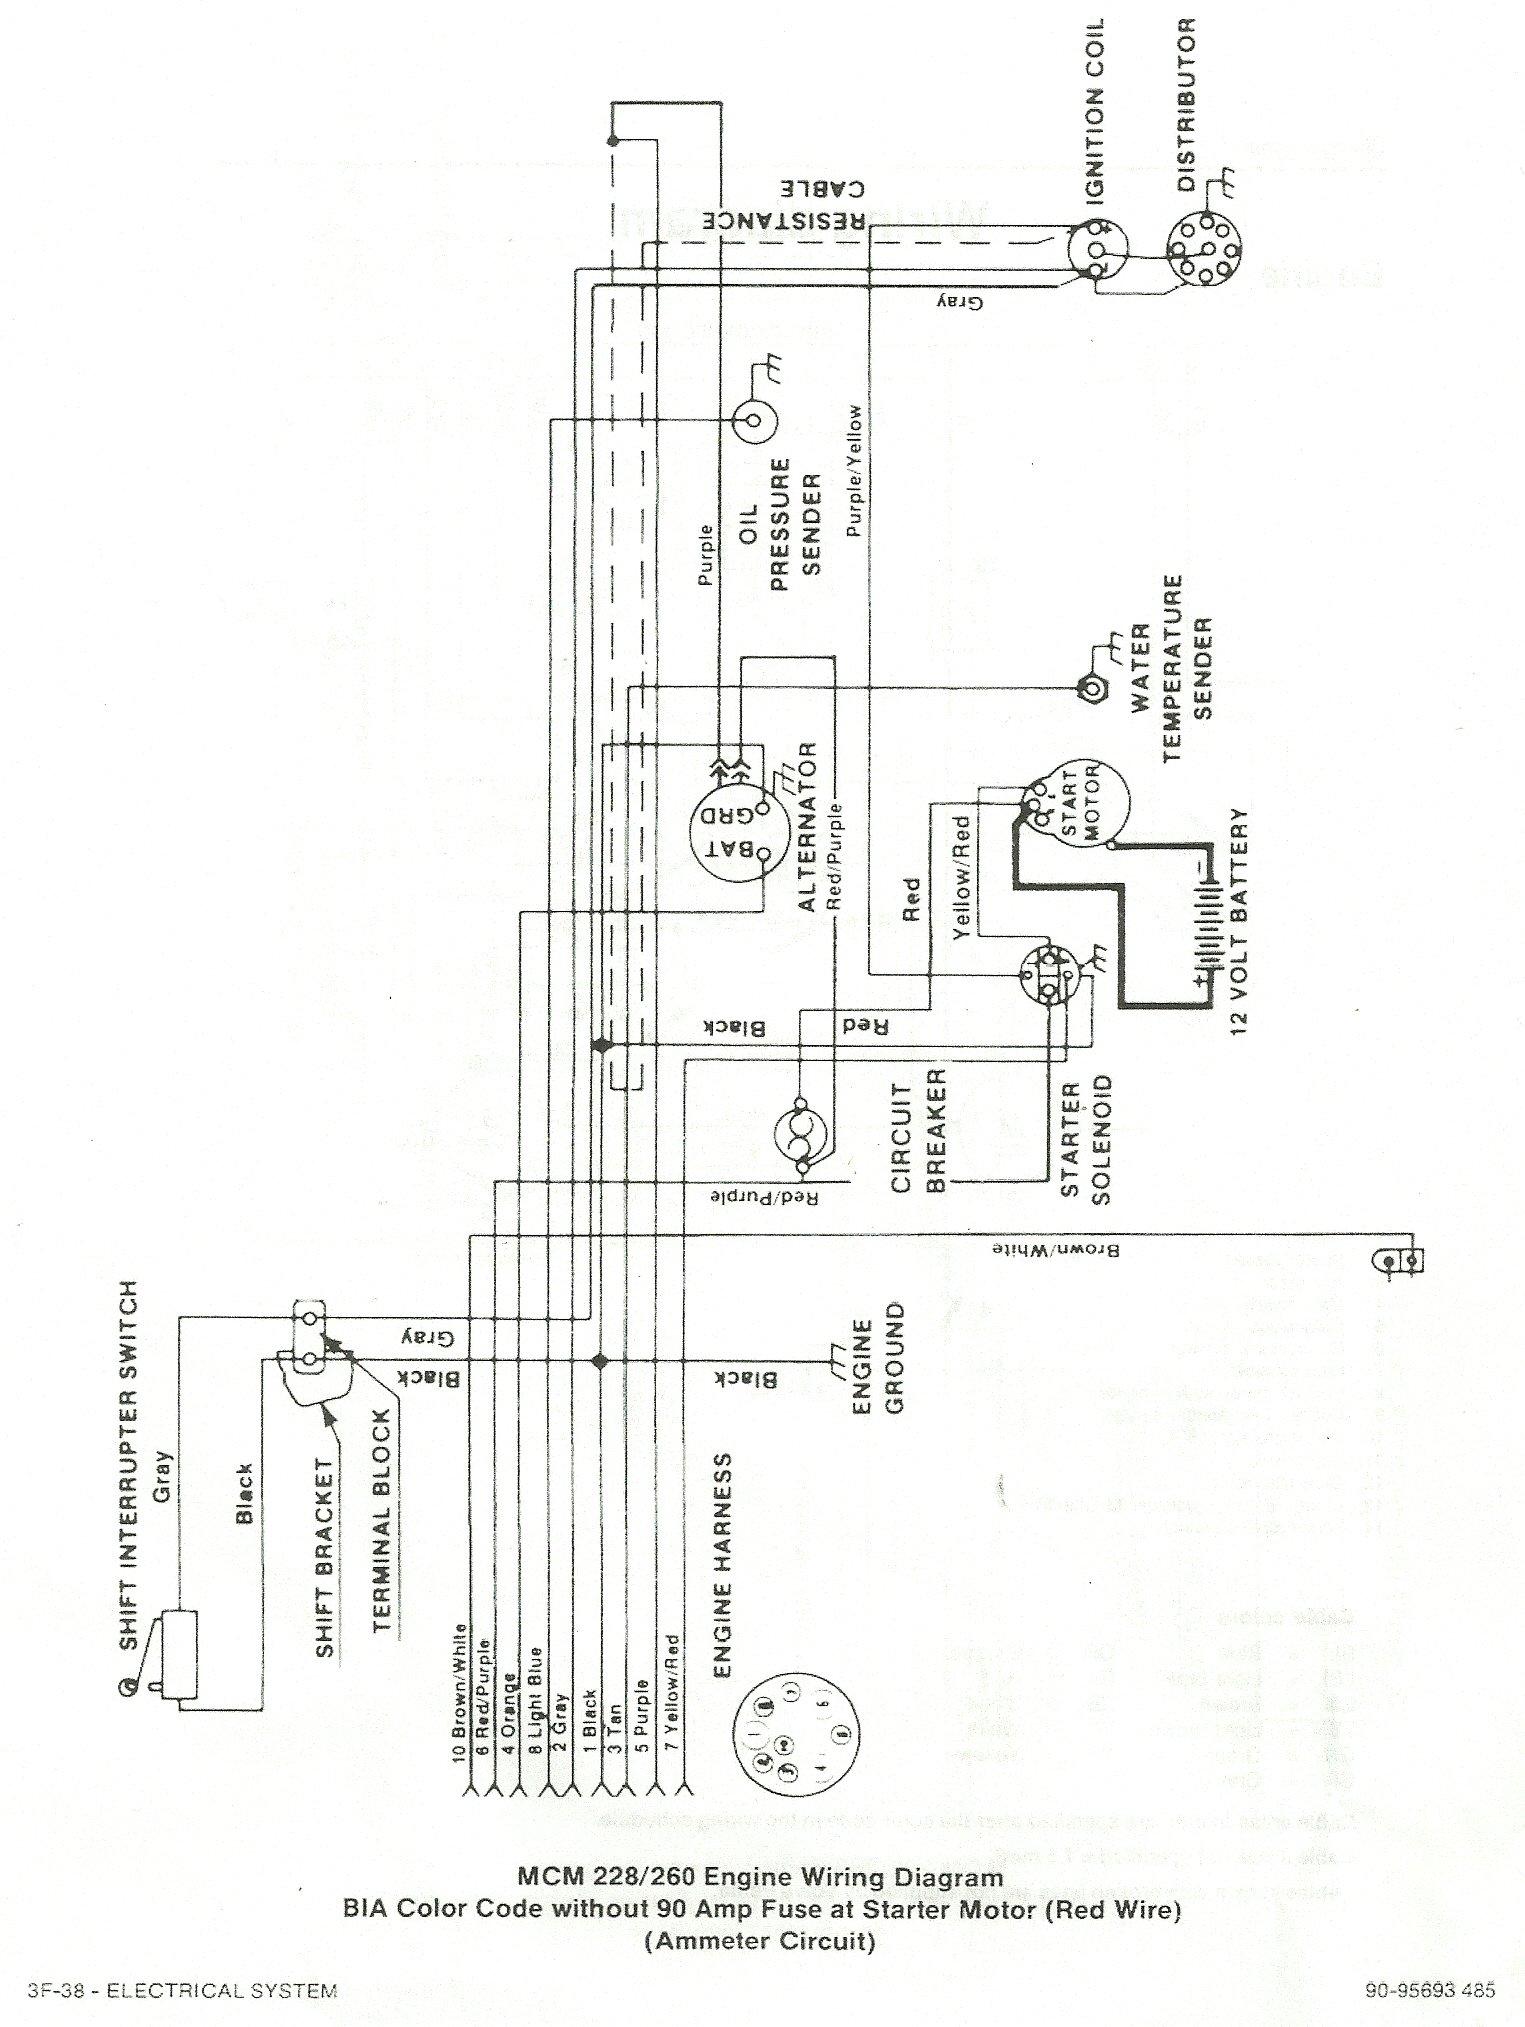 Skiffcraft Mercruiser 470 Wiring Diagram